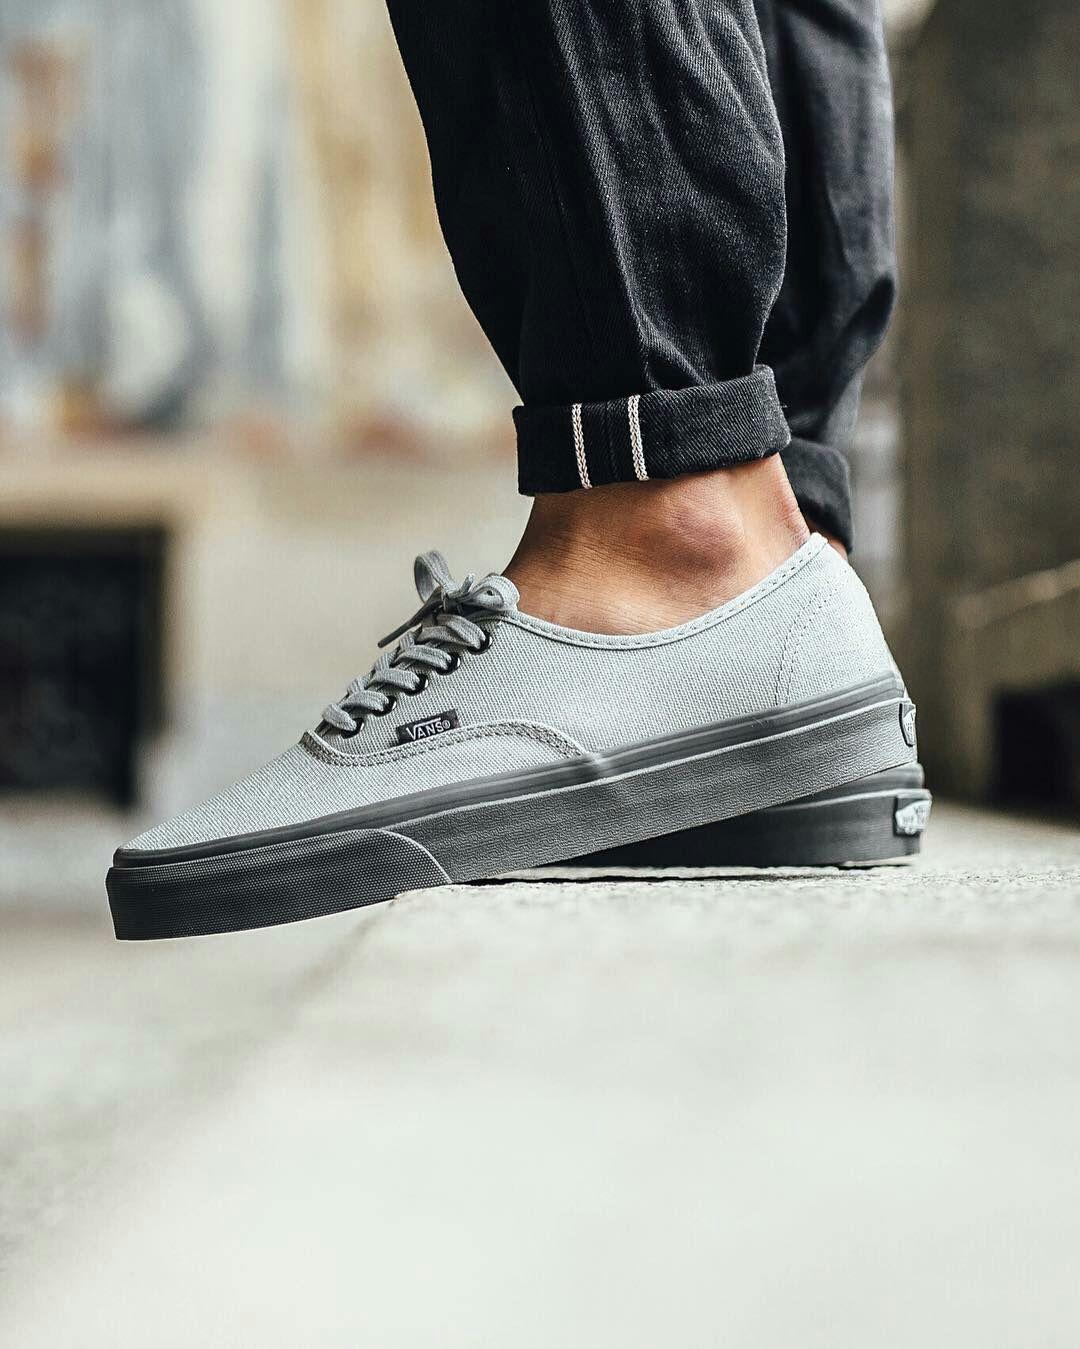 shoes, sneaker ,sneakers, kicks ,sole adidas adidas originals ,zx flux,